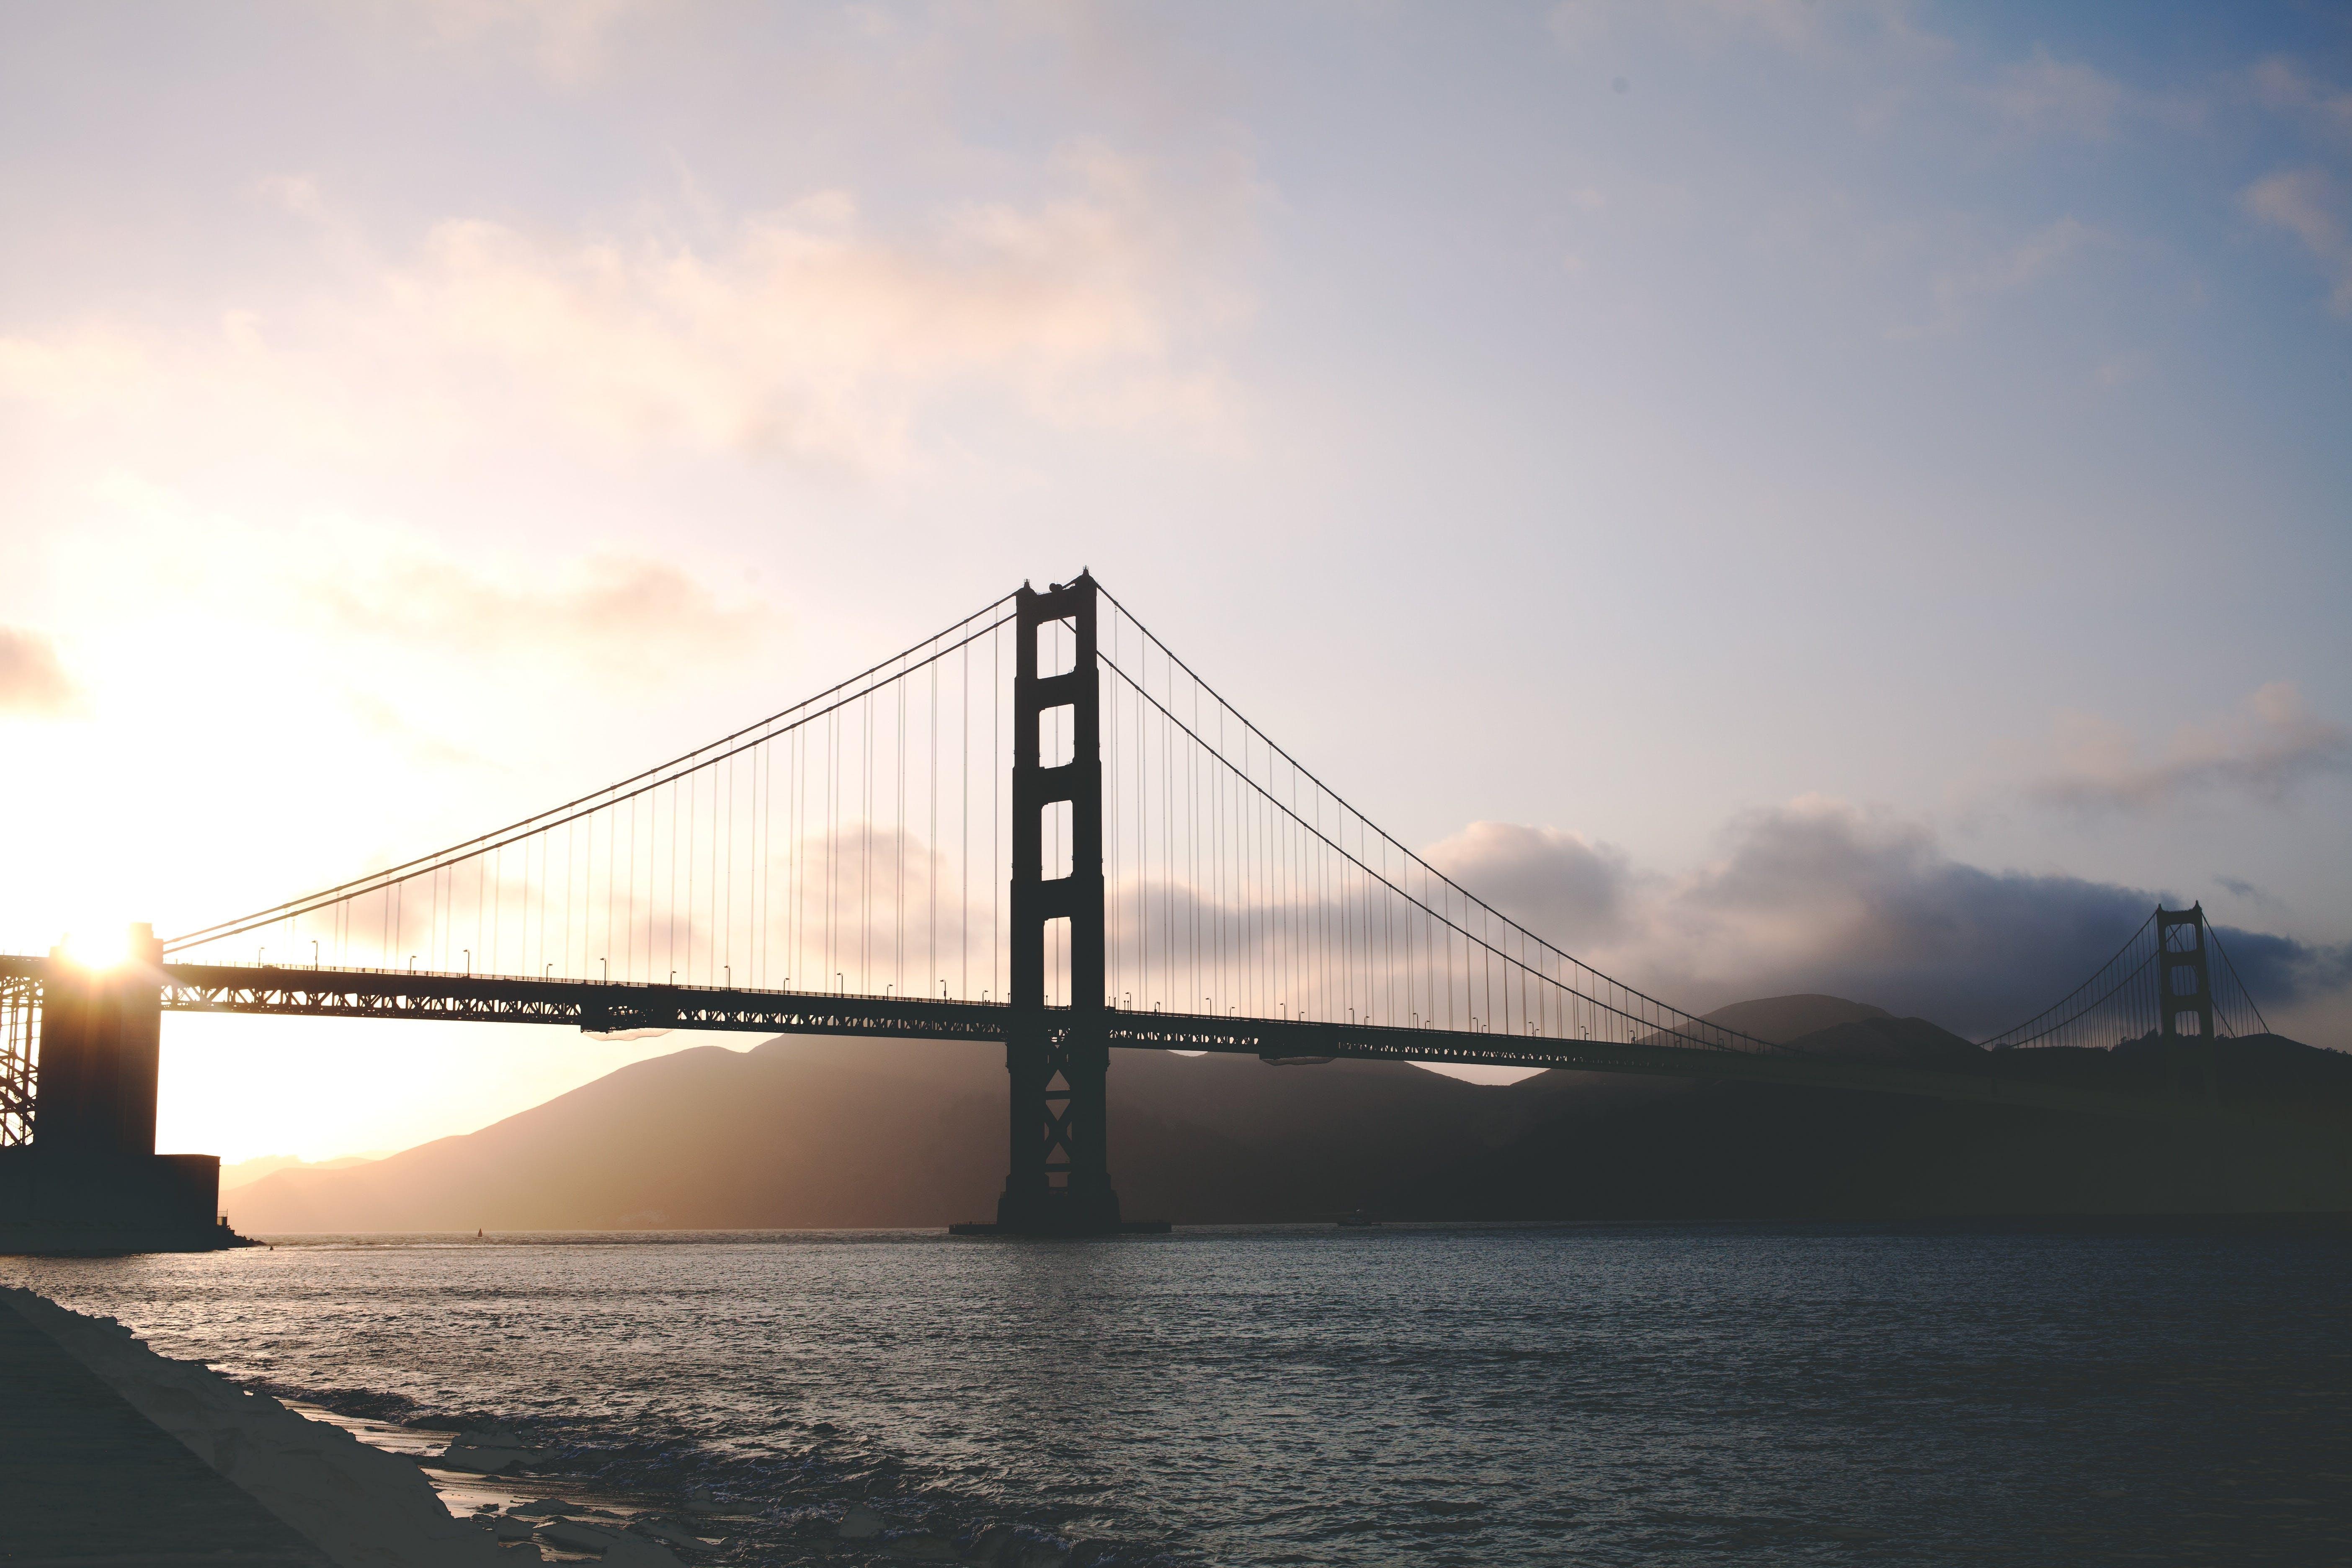 Free stock photo of sunset, water, ocean, bridge